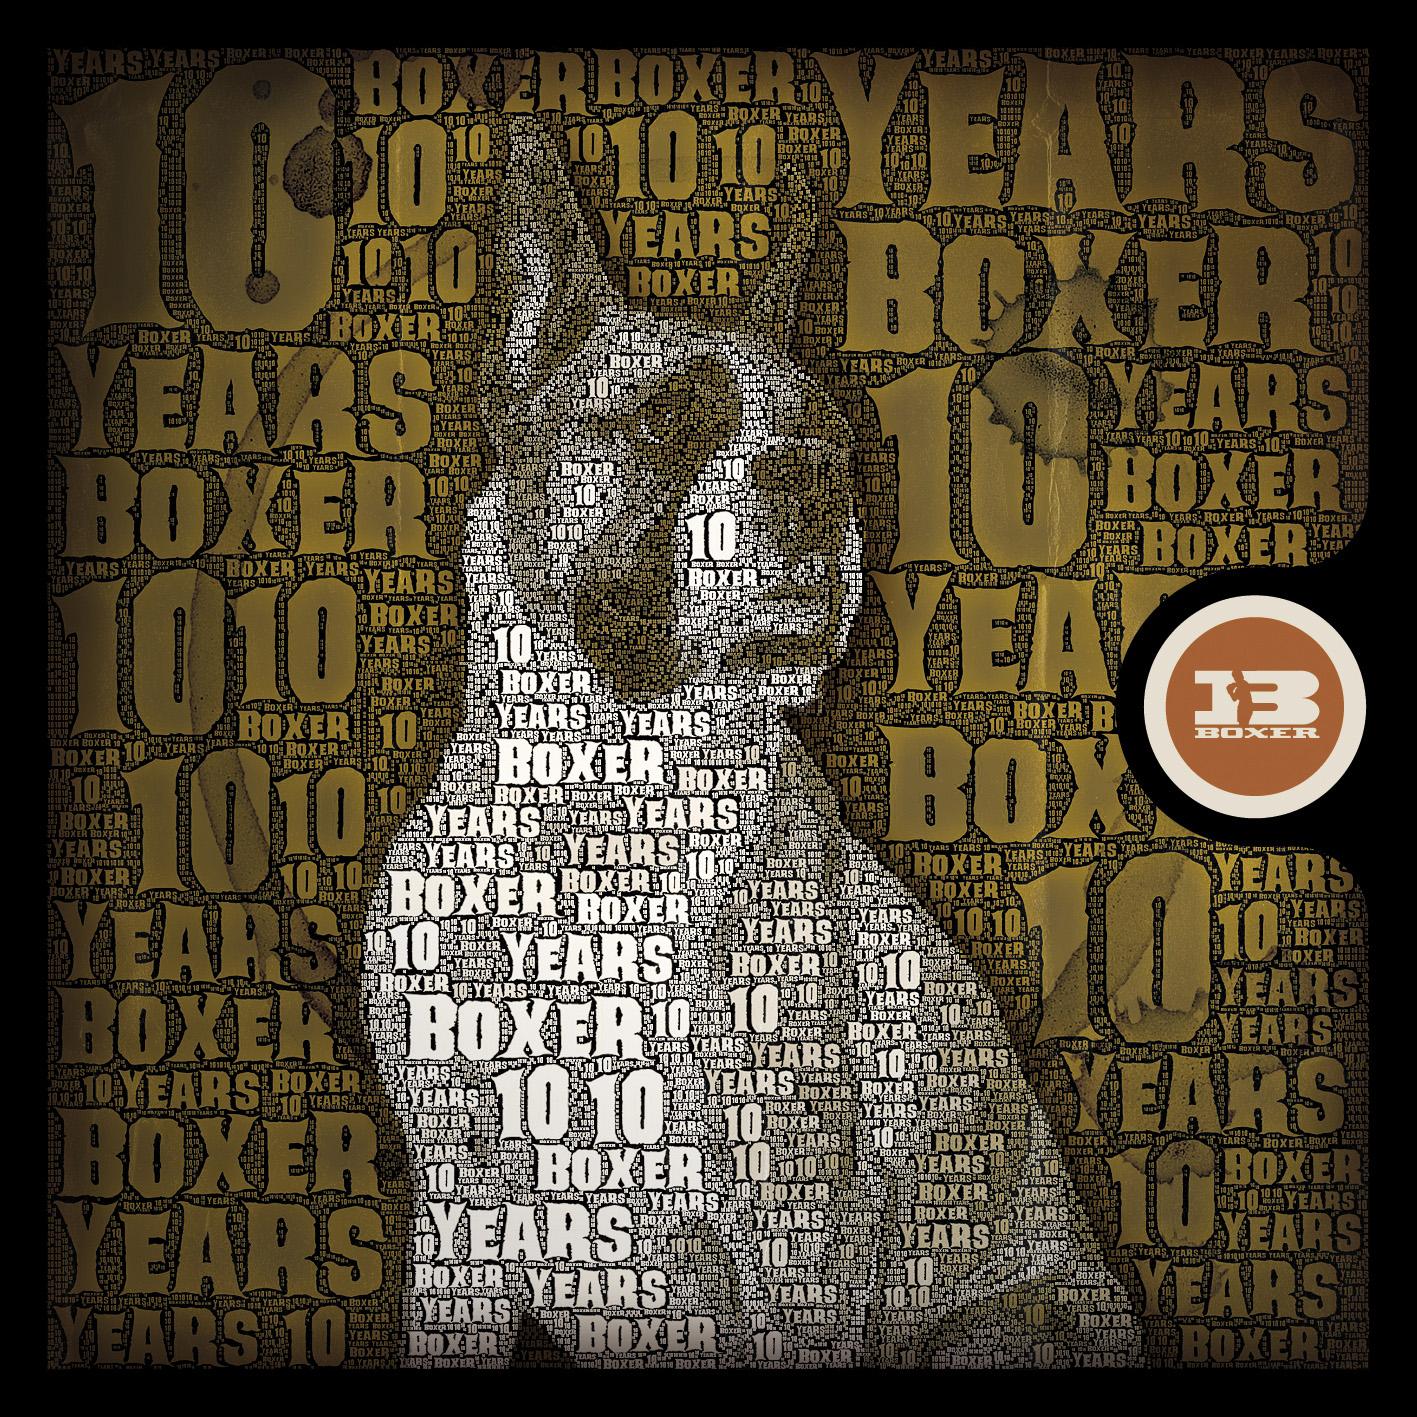 Boxer Recordings feiert 10. Geburtstag mit Robag Wruhme, Extrawelt, Popnoname etc.